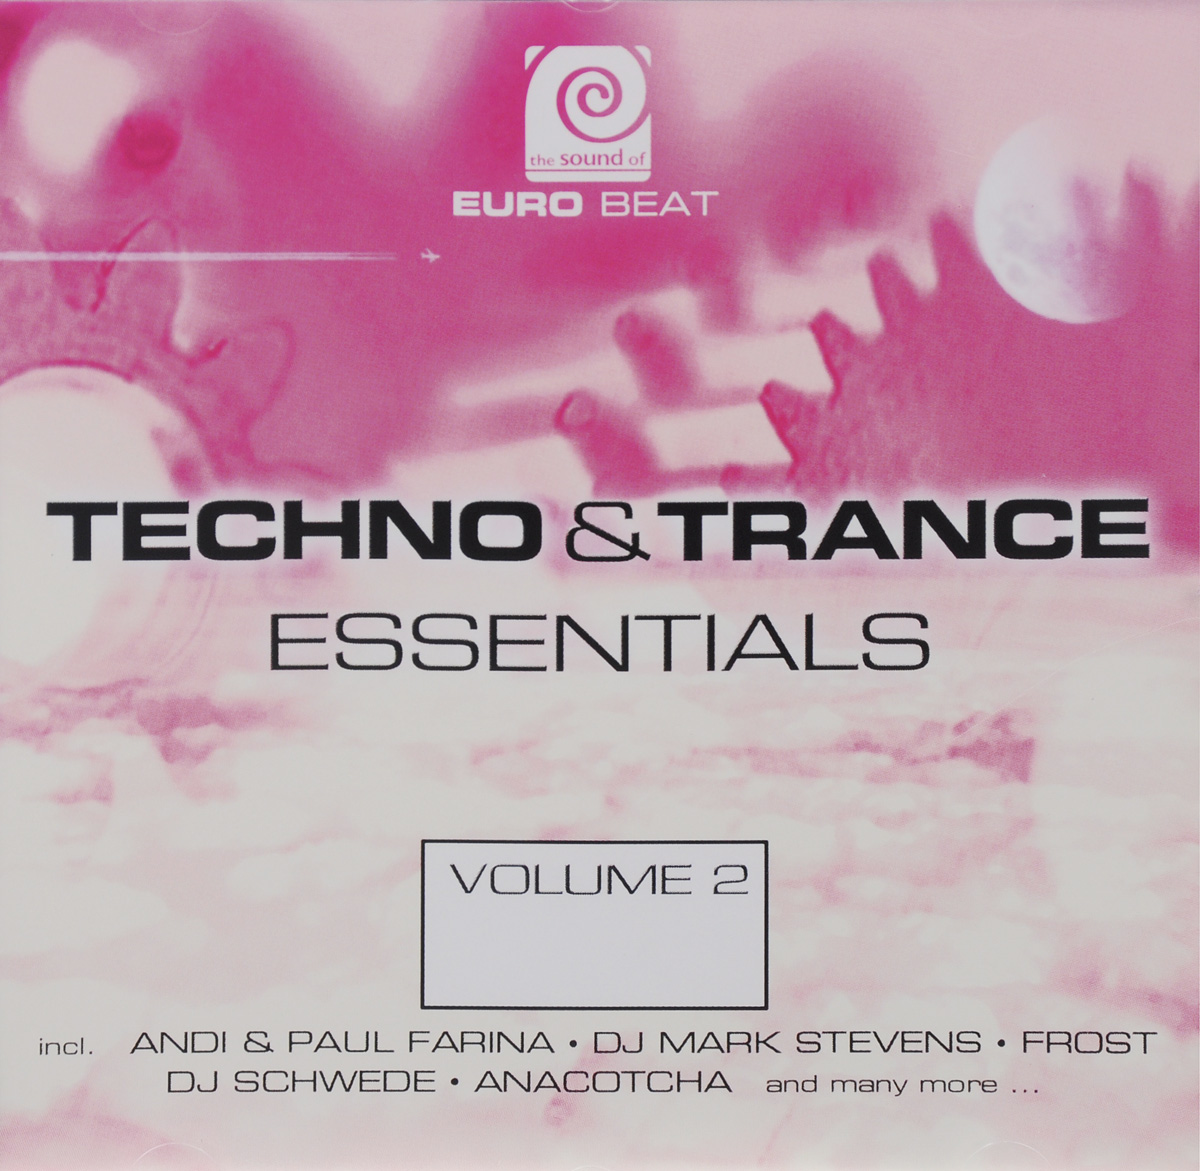 Euro Beat - Techno & Trance Essentials Volume 2